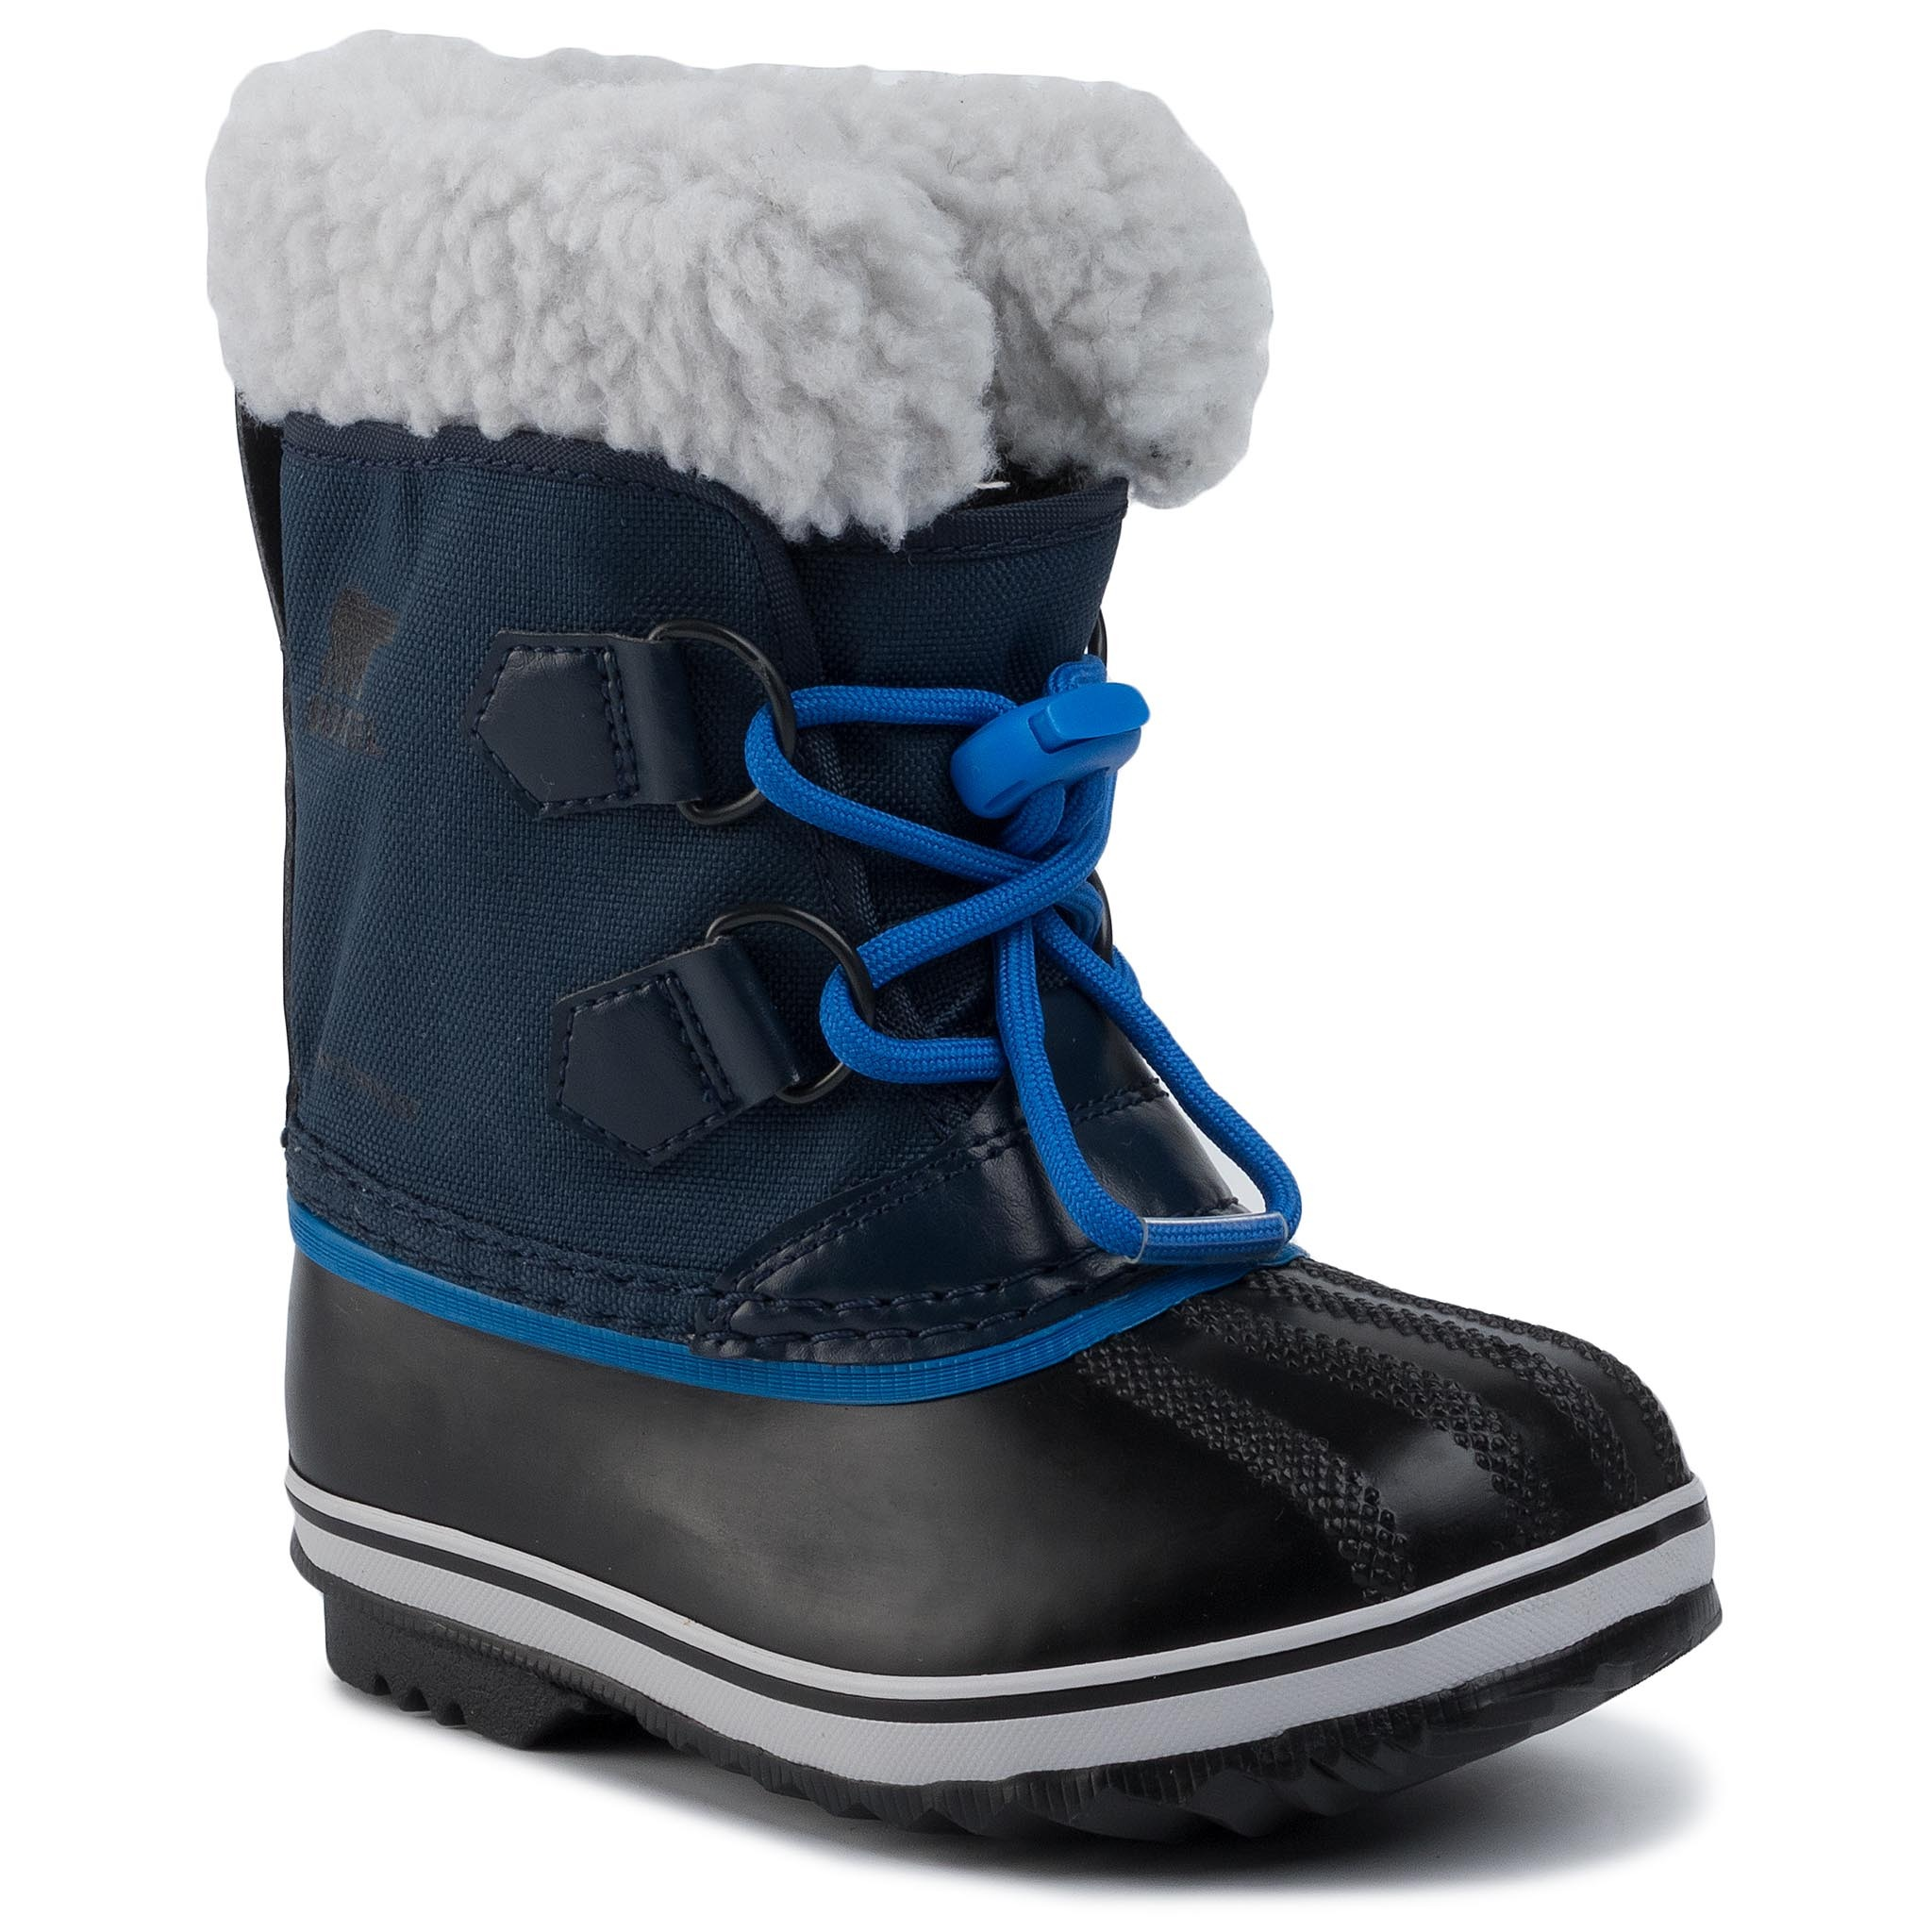 Cizme de zăpadă SOREL - Childres Yoot Pac Nylon NC1962 Collegiate Navy/Super Blue/Bleu Marine Style Universitaire/Ultra Bleu 465